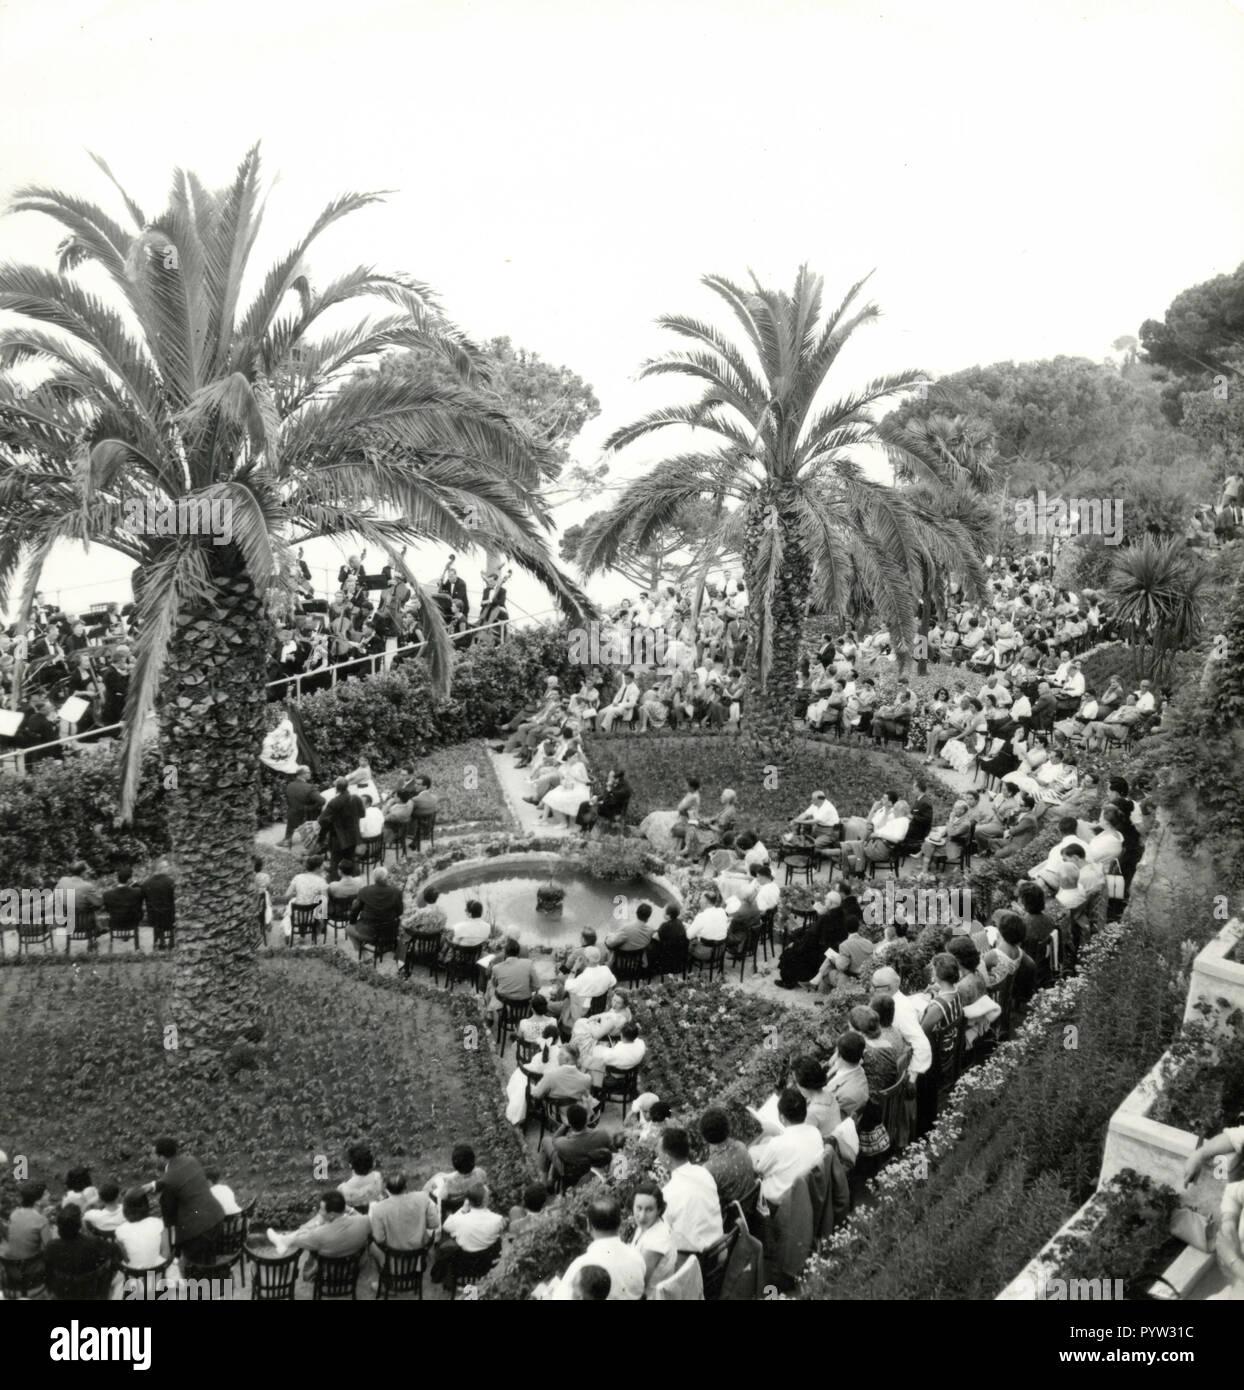 Wagnerian concerts at Villa Rufolo, Ravello, Italy 1960s - Stock Image